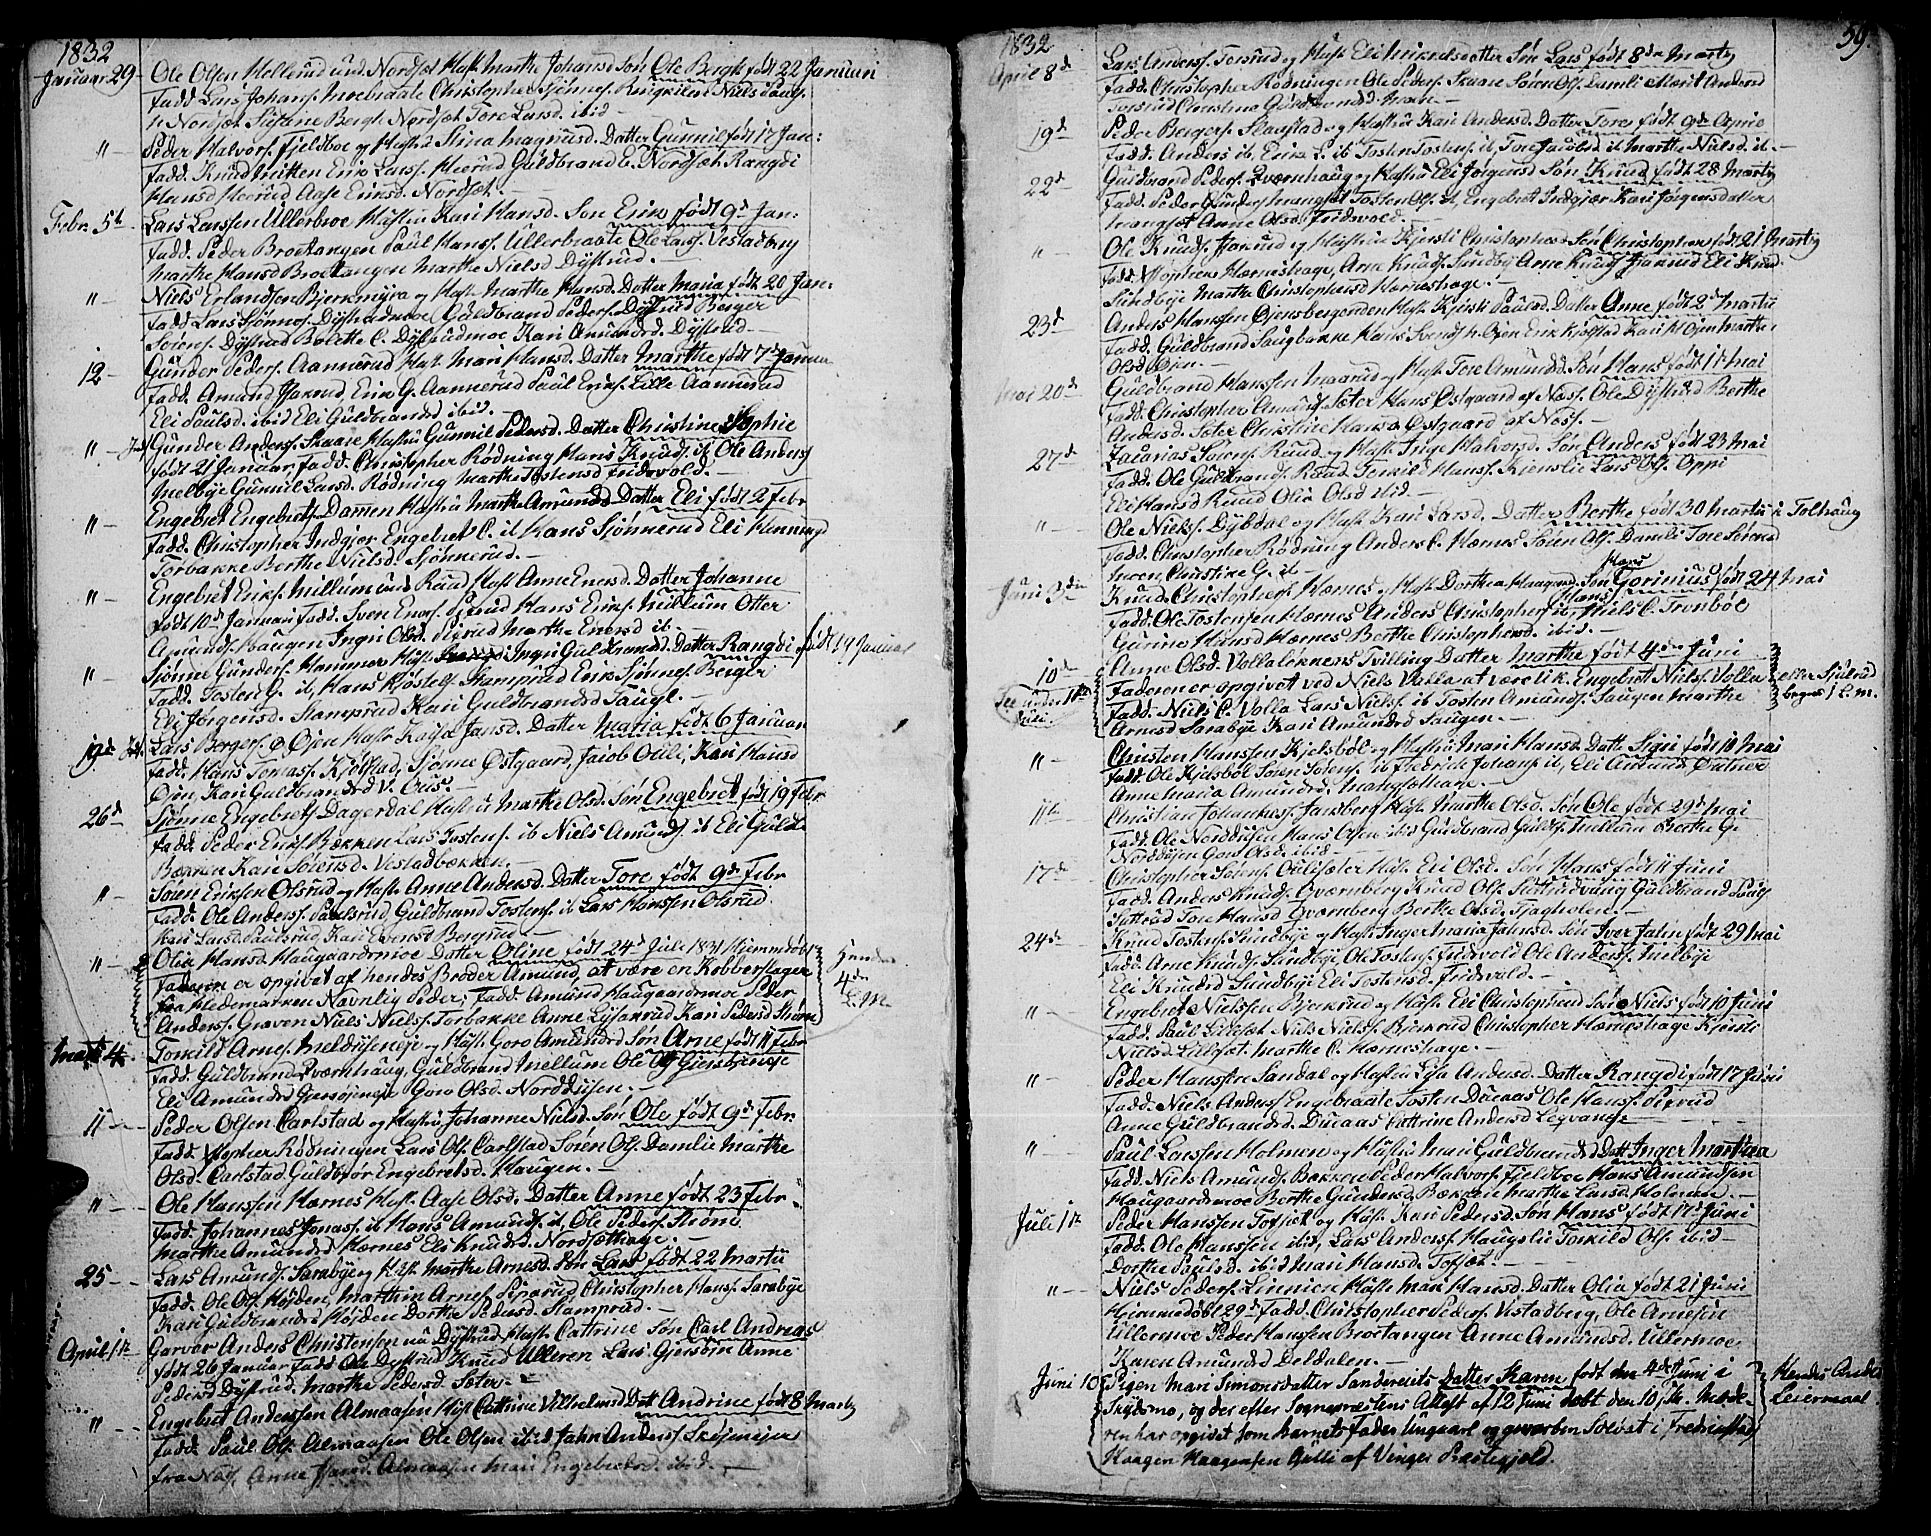 SAH, Strøm-Odalen prestekontor, Ministerialbok nr. 5, 1811-1850, s. 59